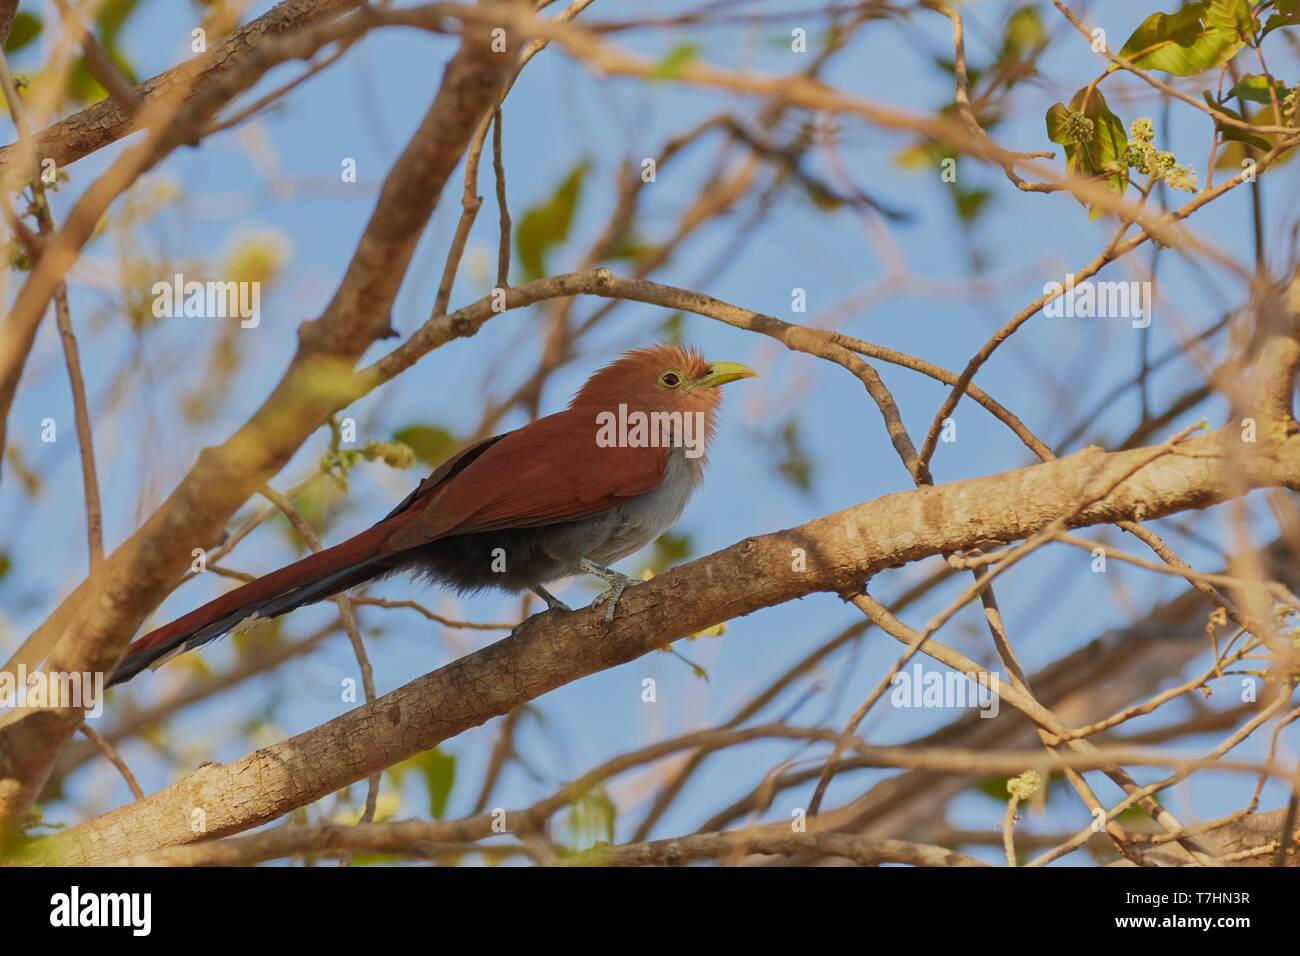 Squirrel Cuckoo, Piaya cayana, Guanacaste province, Costa Rica, Central America - Stock Image